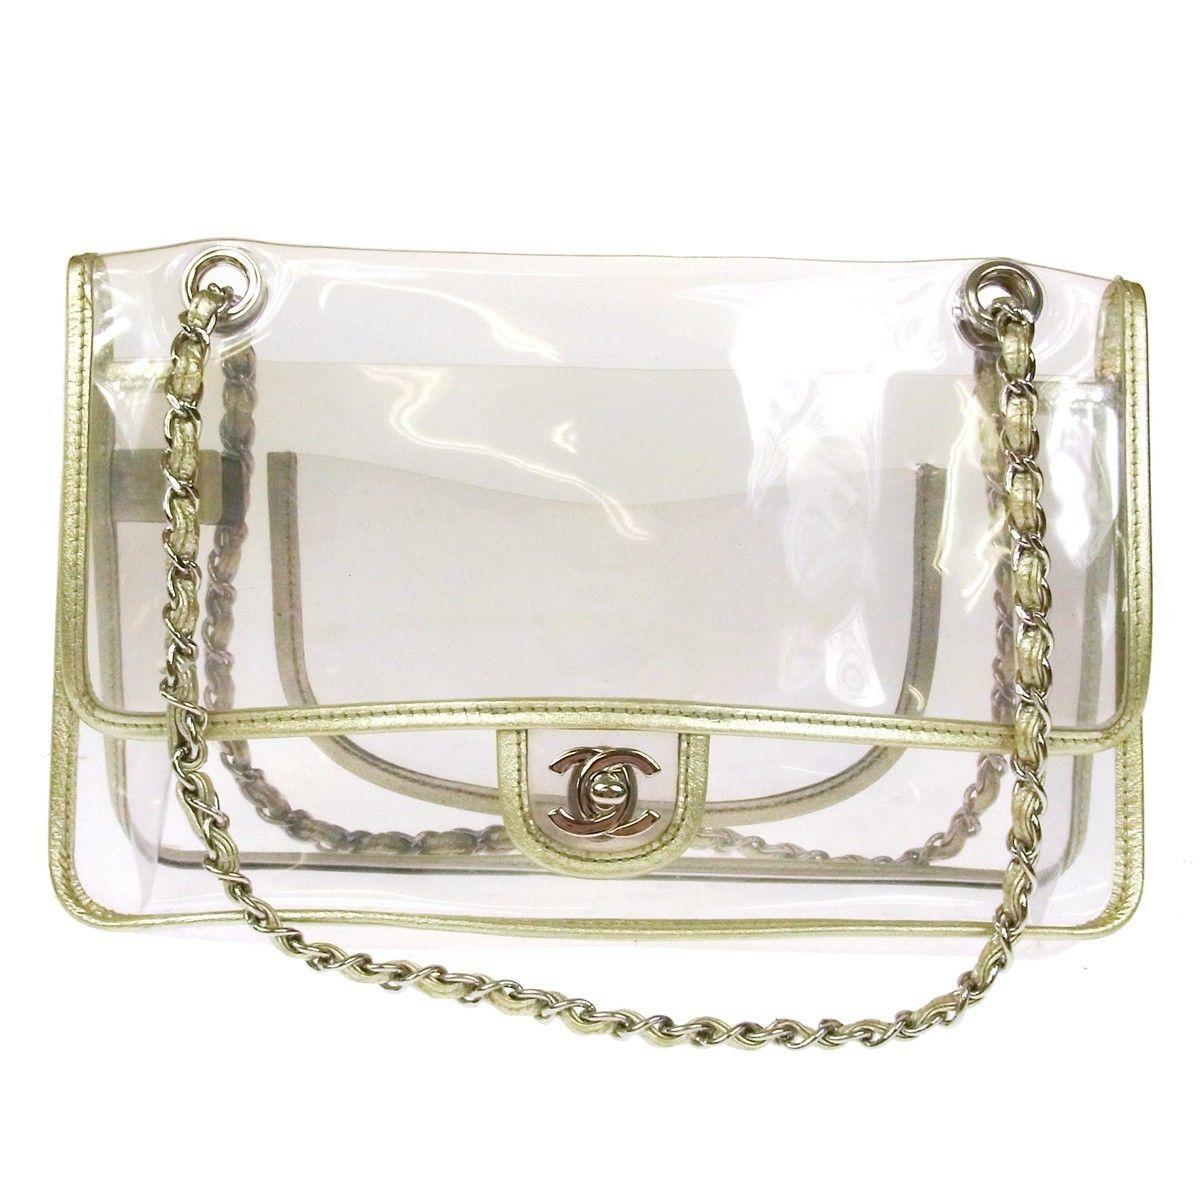 95ed315ee8cc Details about Authentic CHANEL CC Logos Chain Shoulder Bag Clear ...